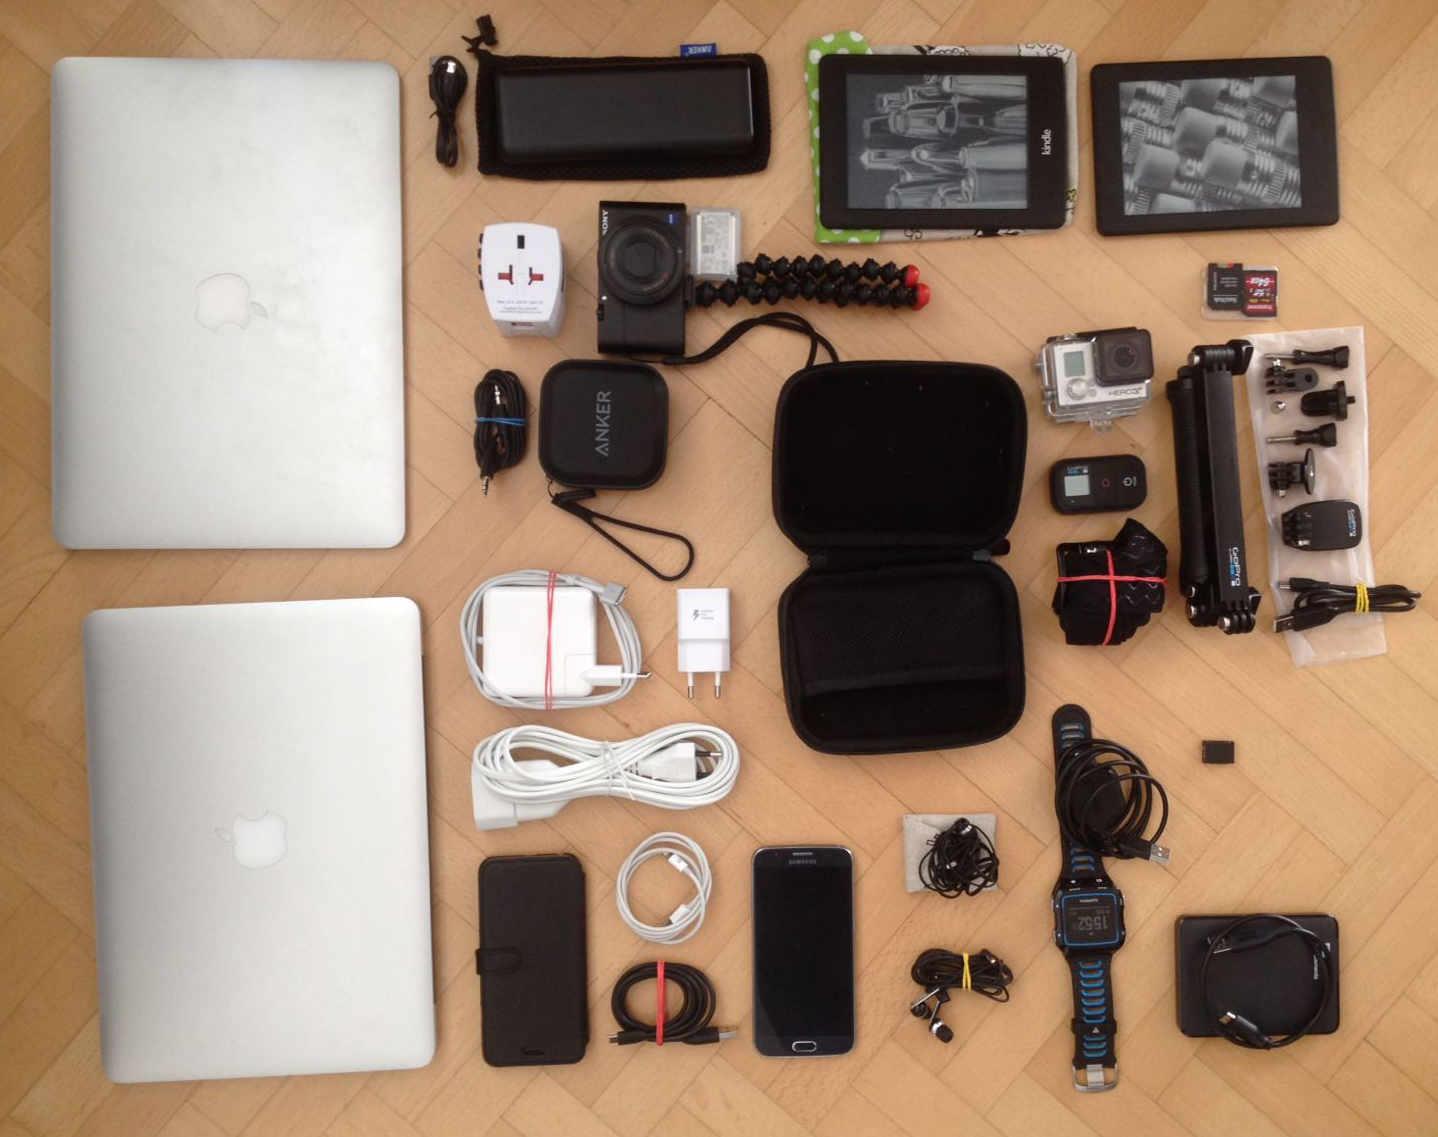 Weltreise Packliste Handgepäck Elektronik